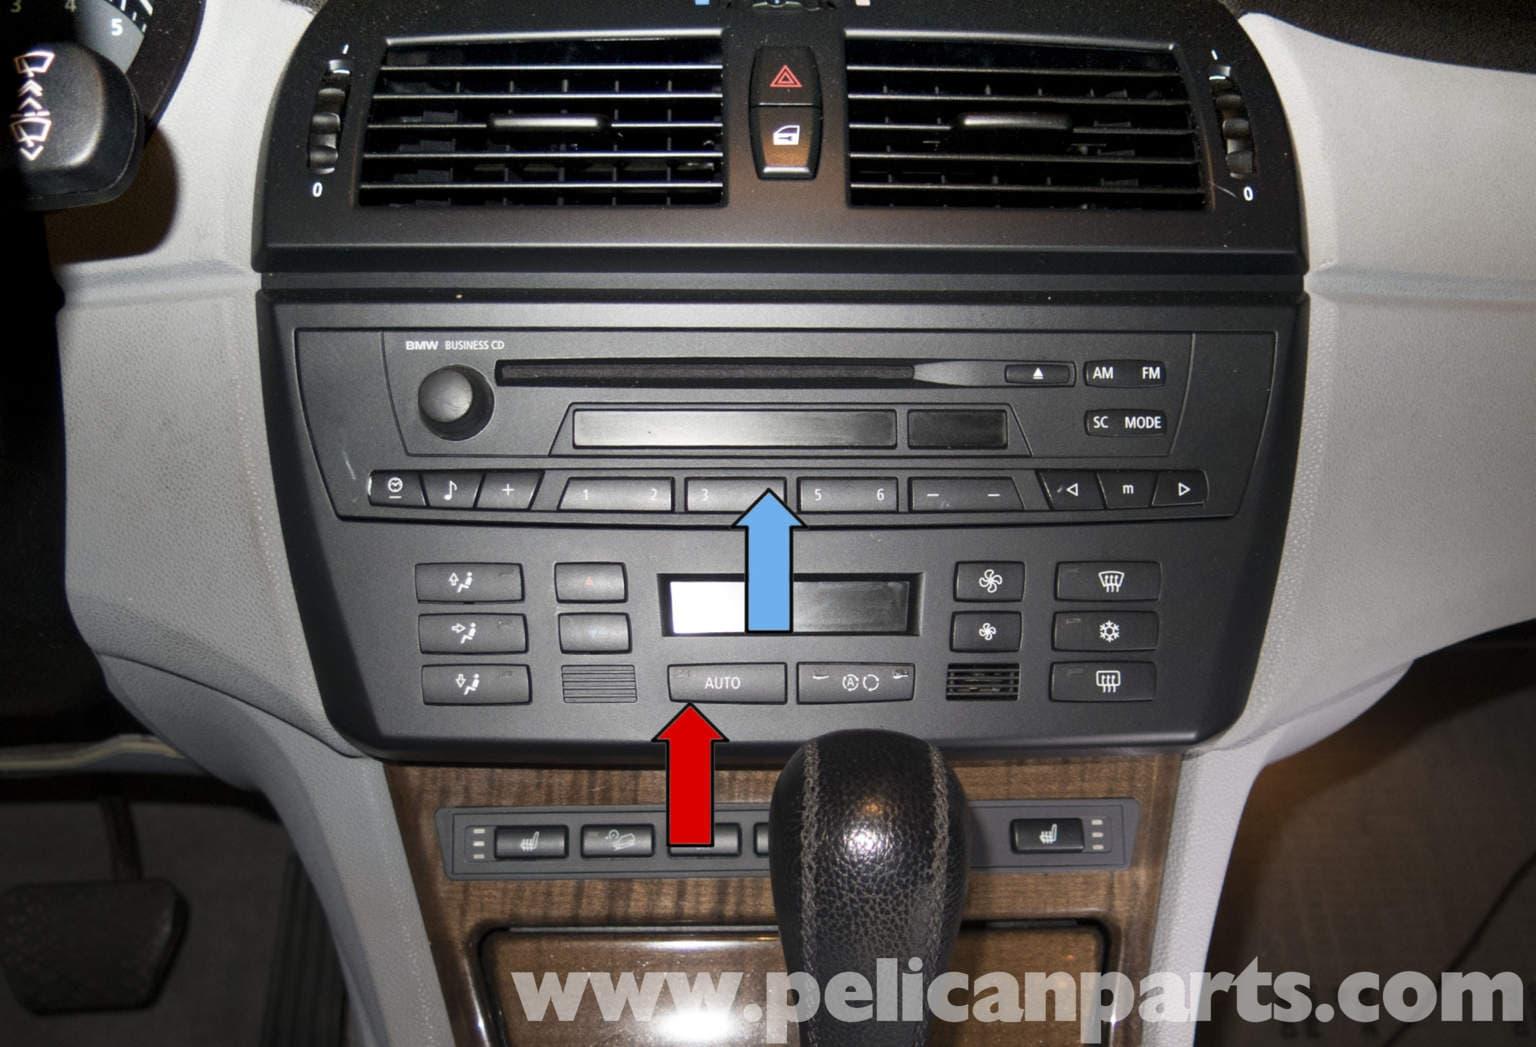 pelican technical article bmw x3 radio ihka panel replacement rh pelicanparts com 2006 BMW X3 2015 BMW X3